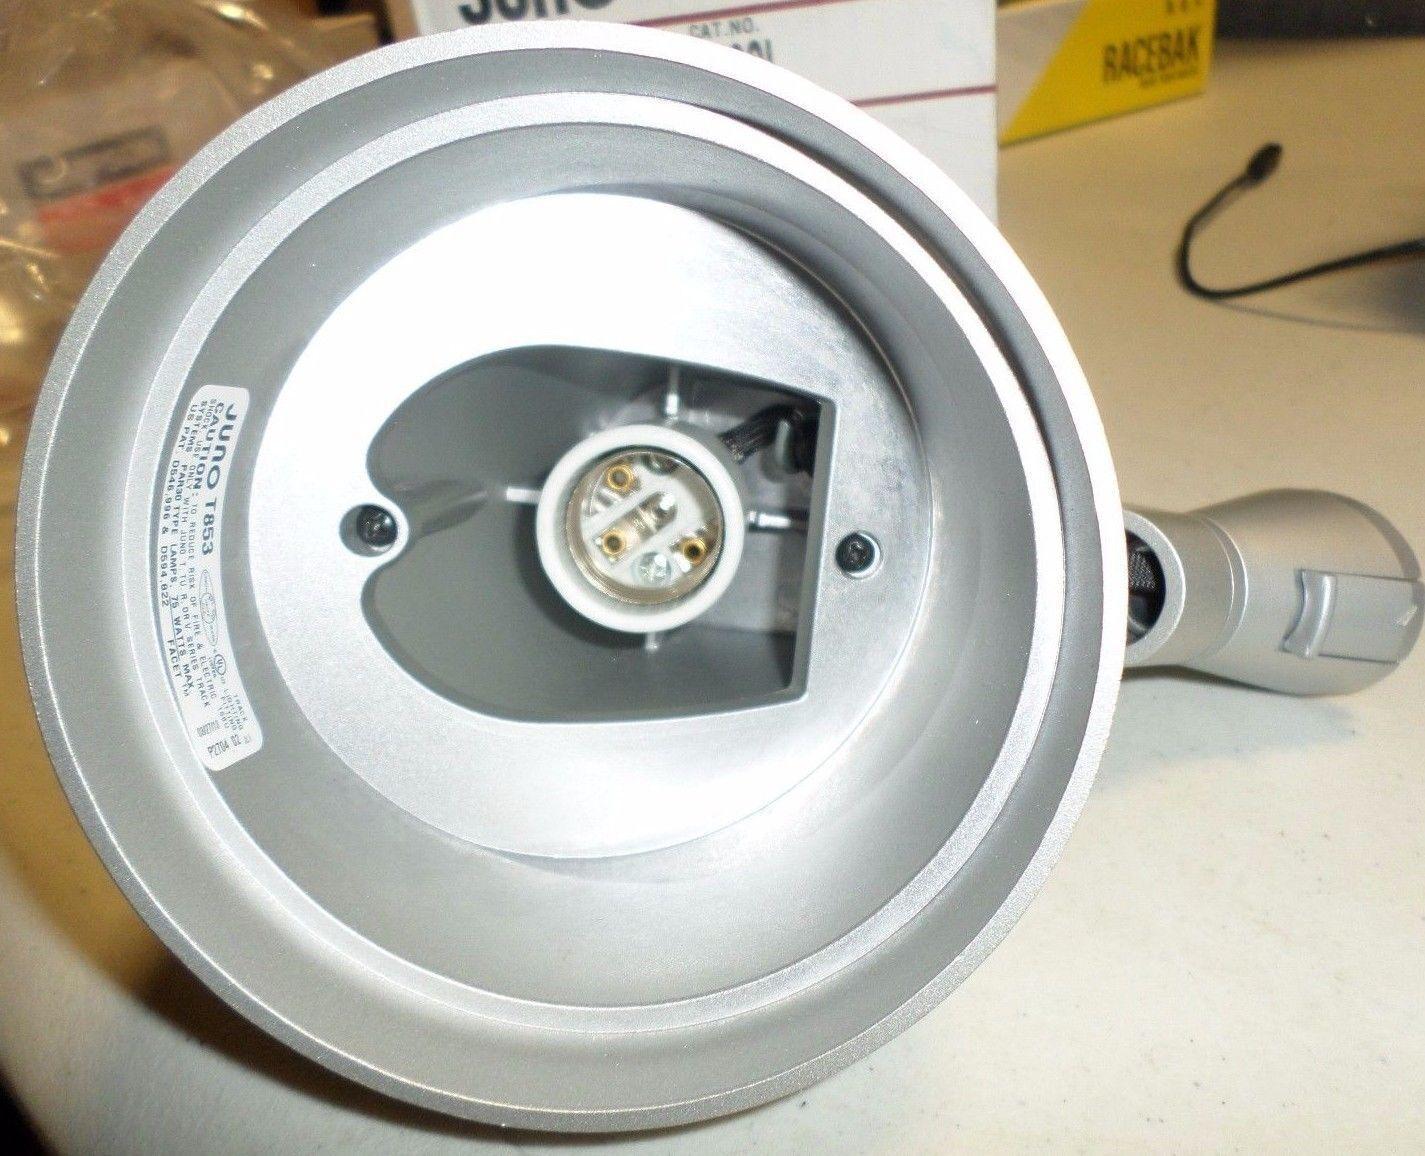 Juno Lighting T853SL Trac-Master faceta voltaje de línea 75W PAR30 portalámpara Plata